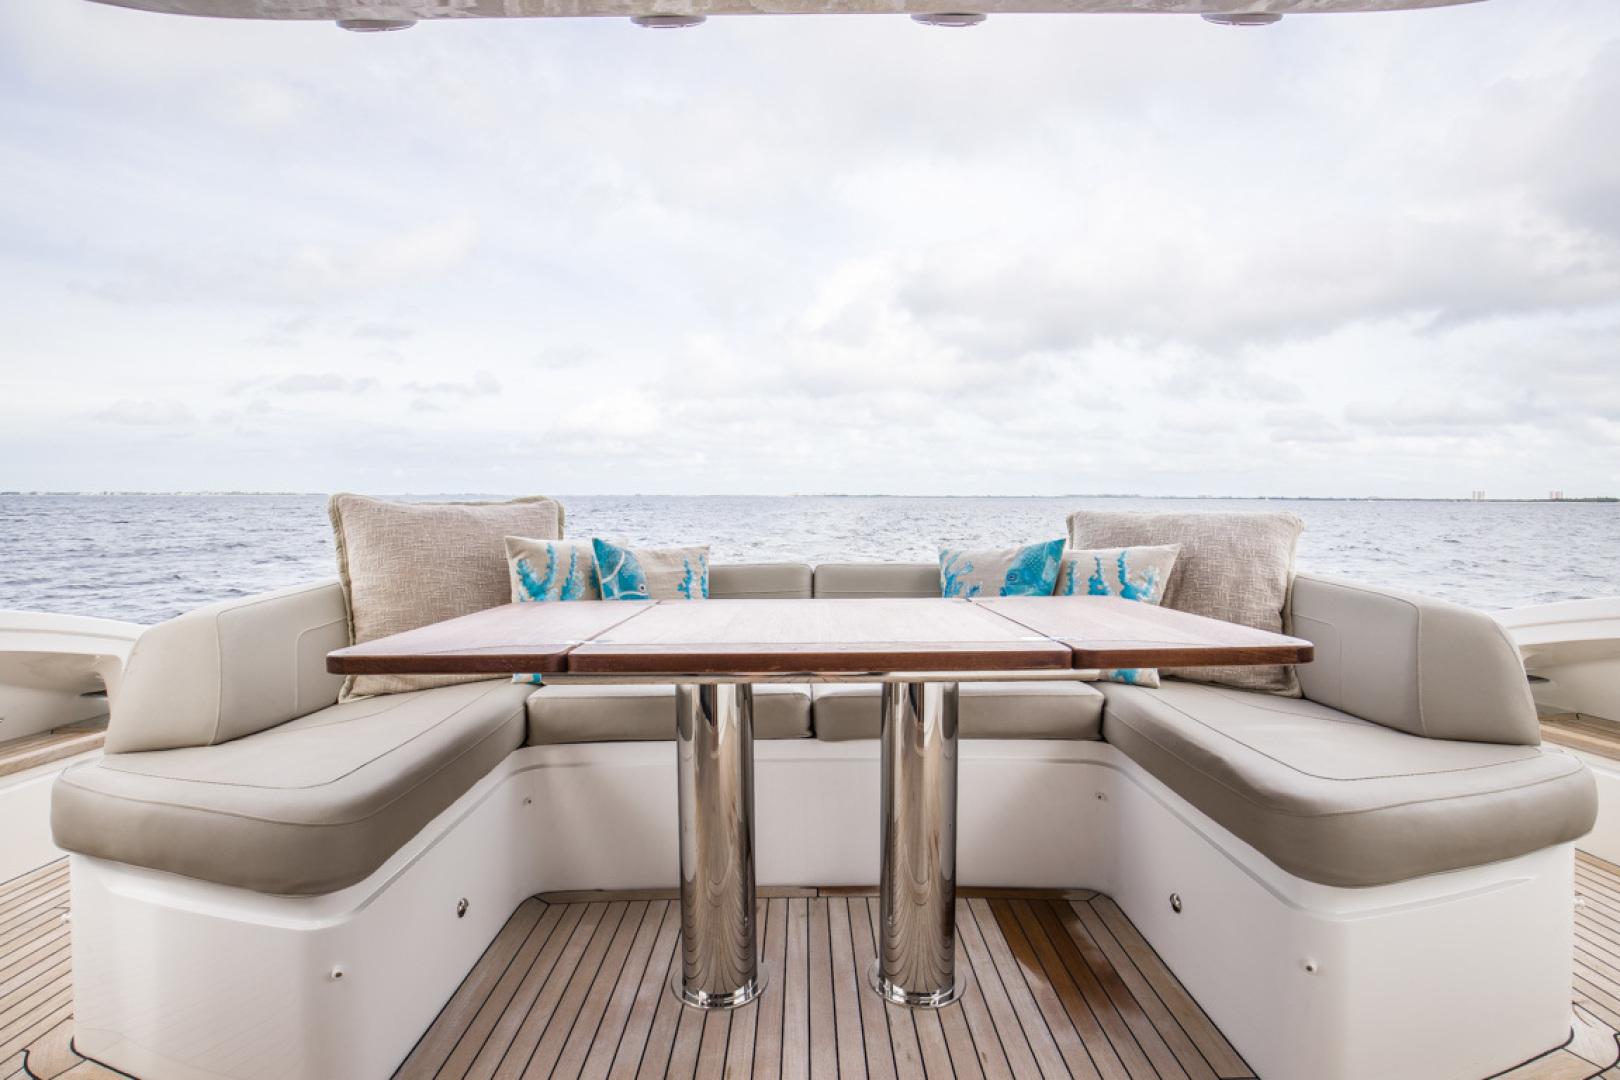 Princess-S65 2019-Paragon Cape Coral-Florida-United States-2019 65 Princess S65-Paragon-Cockpit-1510257 | Thumbnail